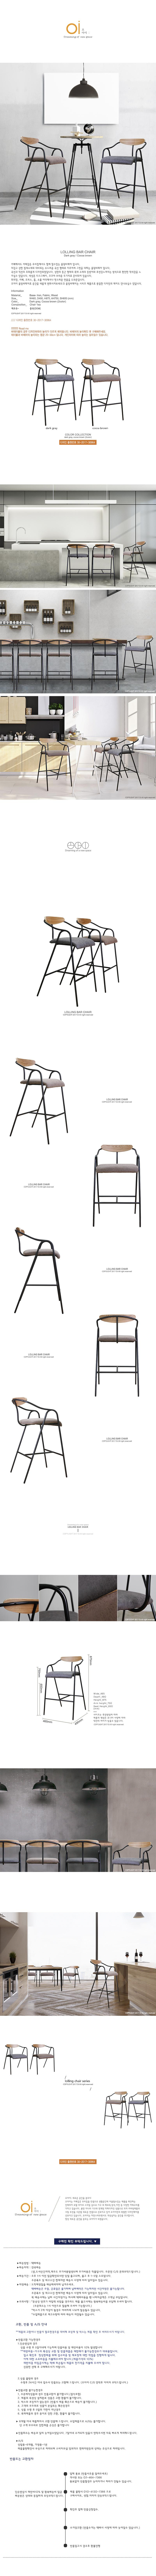 lolling bar chair - 오아이, 99,000원, 디자인 의자, 스틸의자